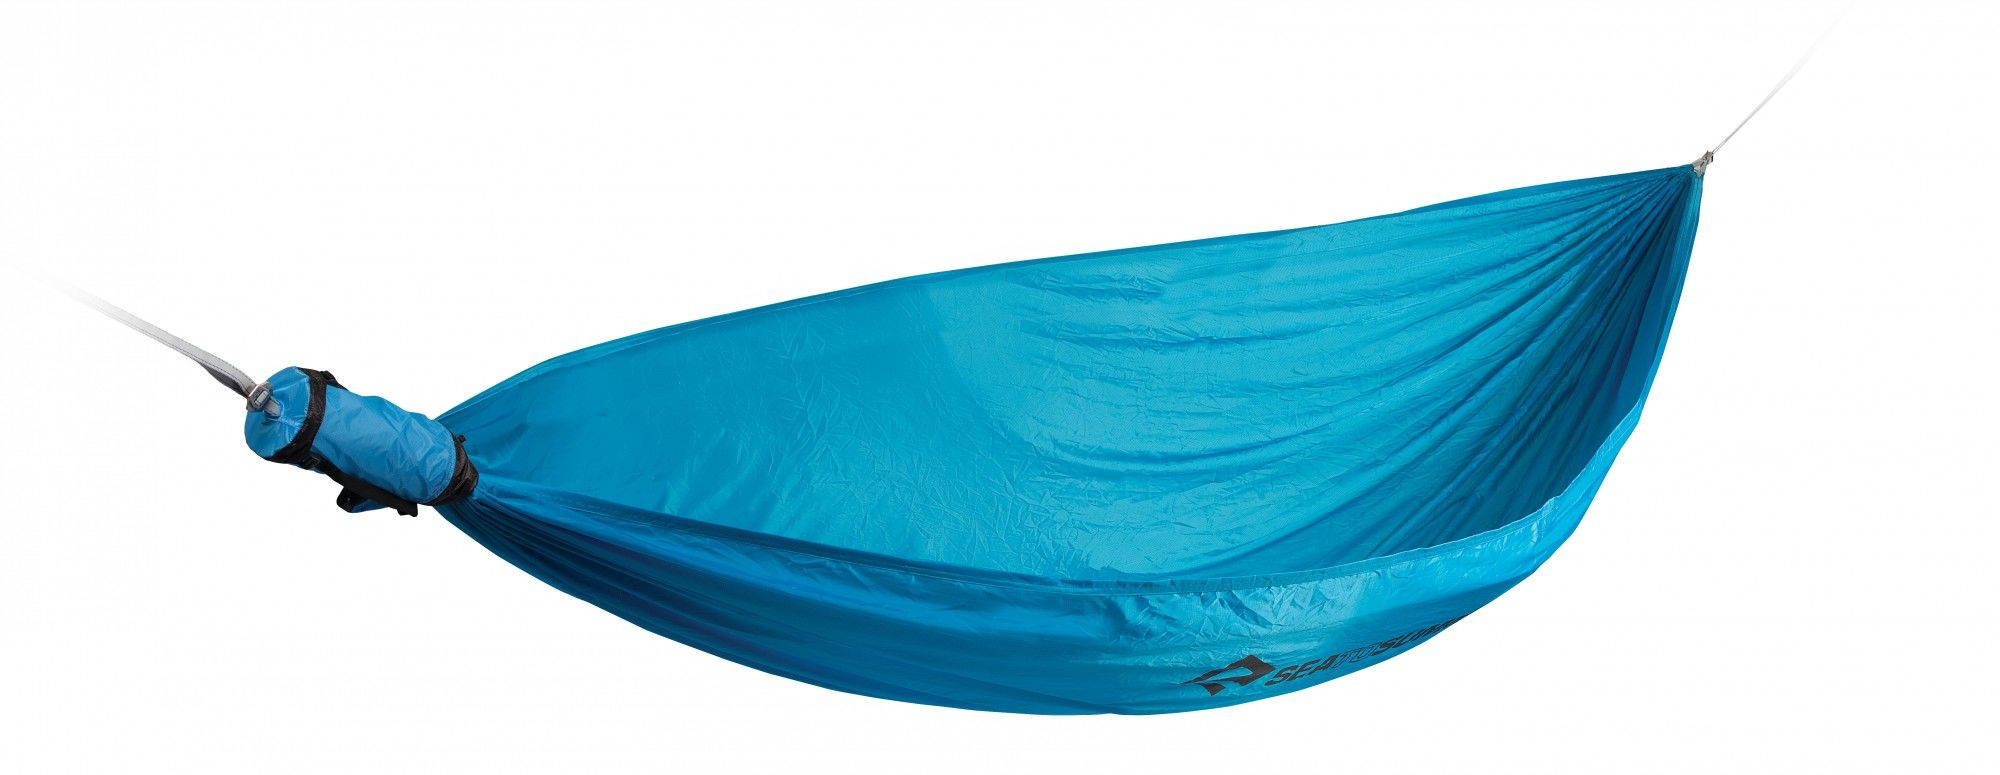 Sea to Summit Hammock Pro Single Blau, One Size -Farbe Blue, One Size